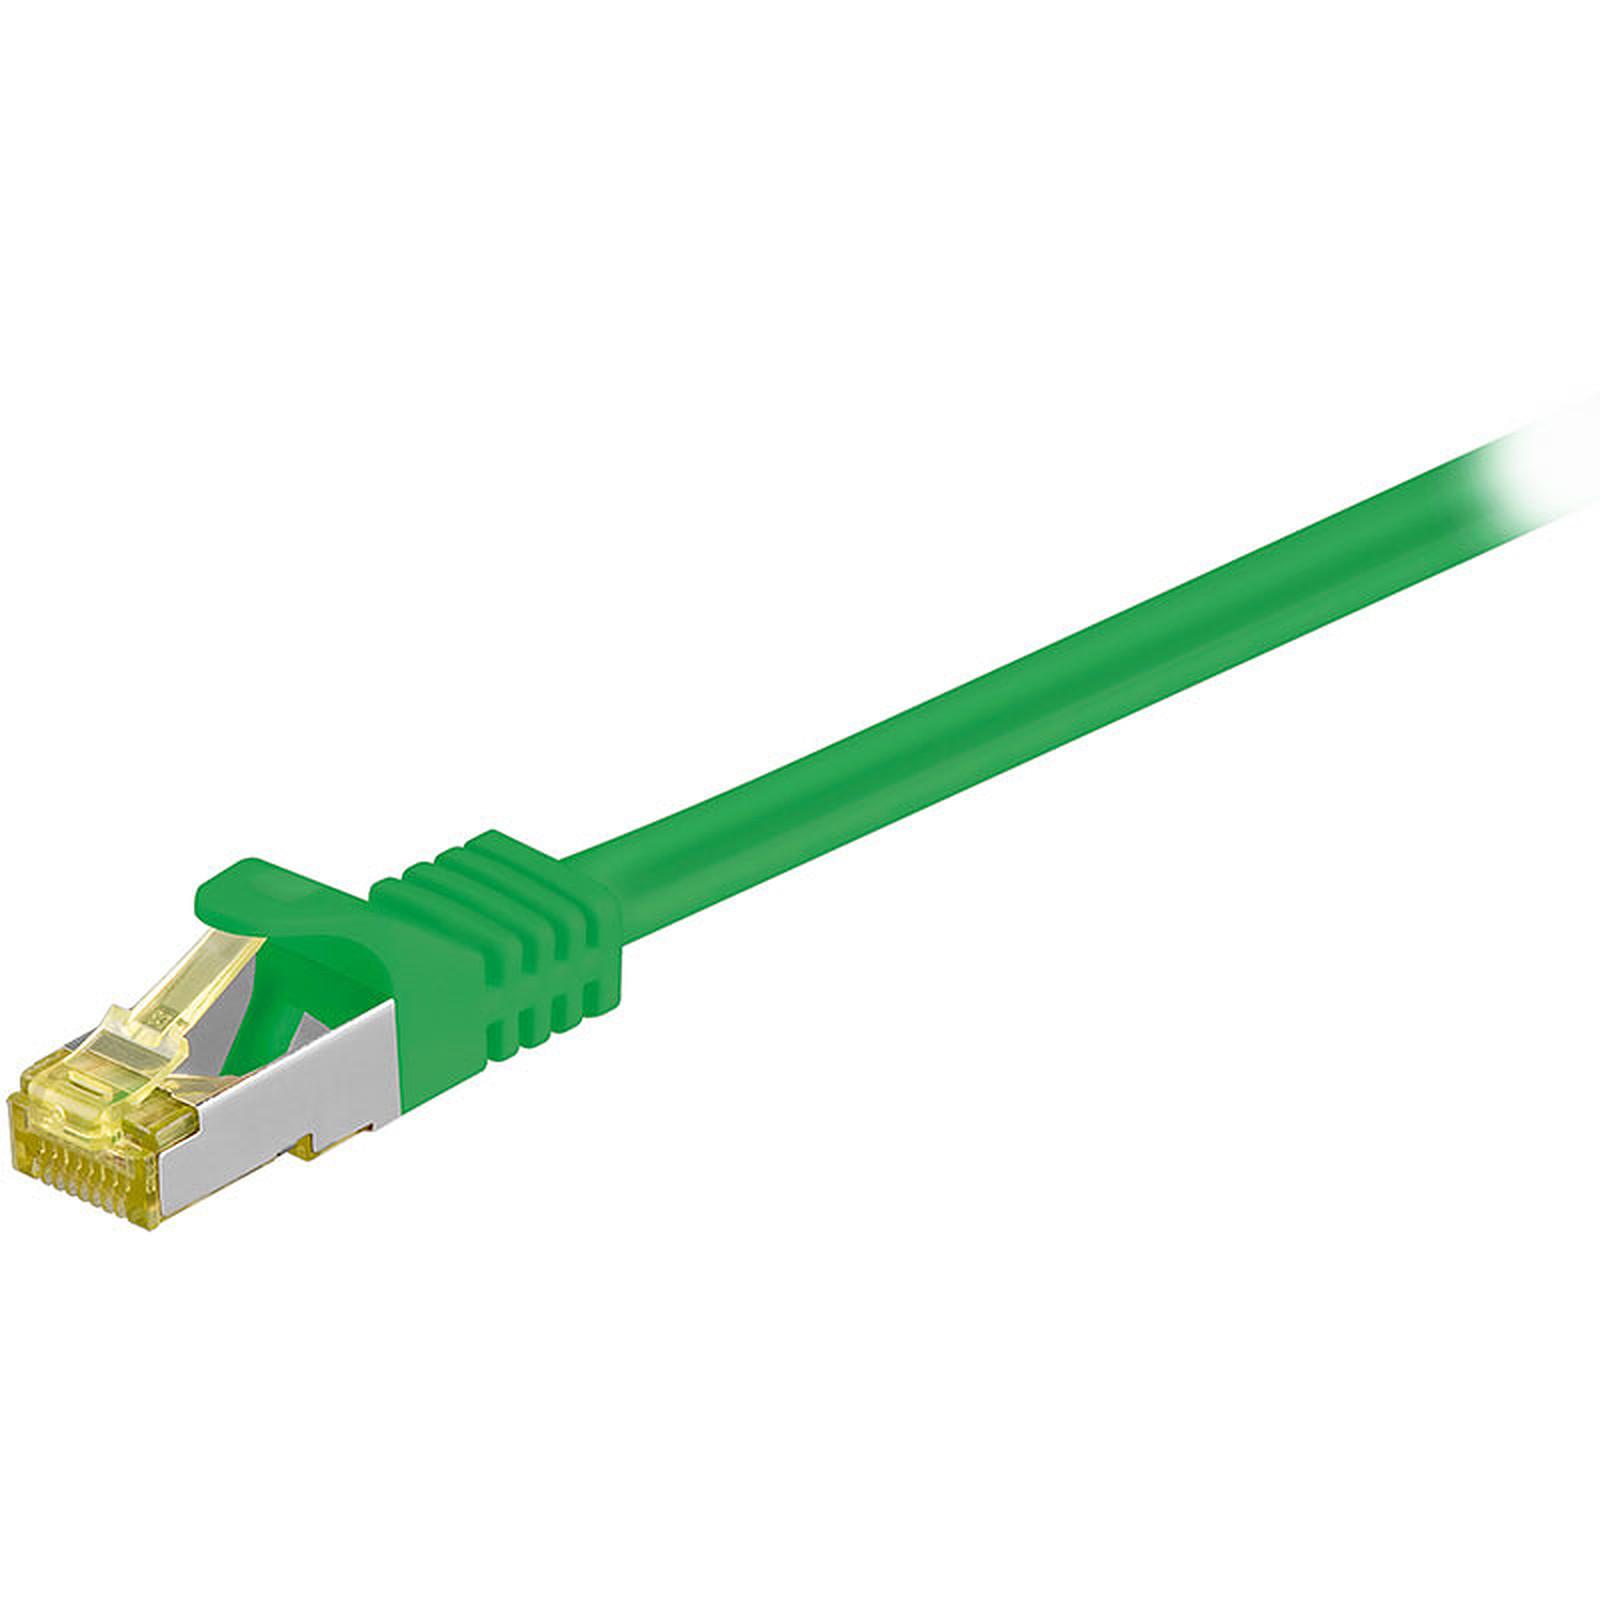 Cable RJ45 categoría 7 S/FTP 10 m (verde)